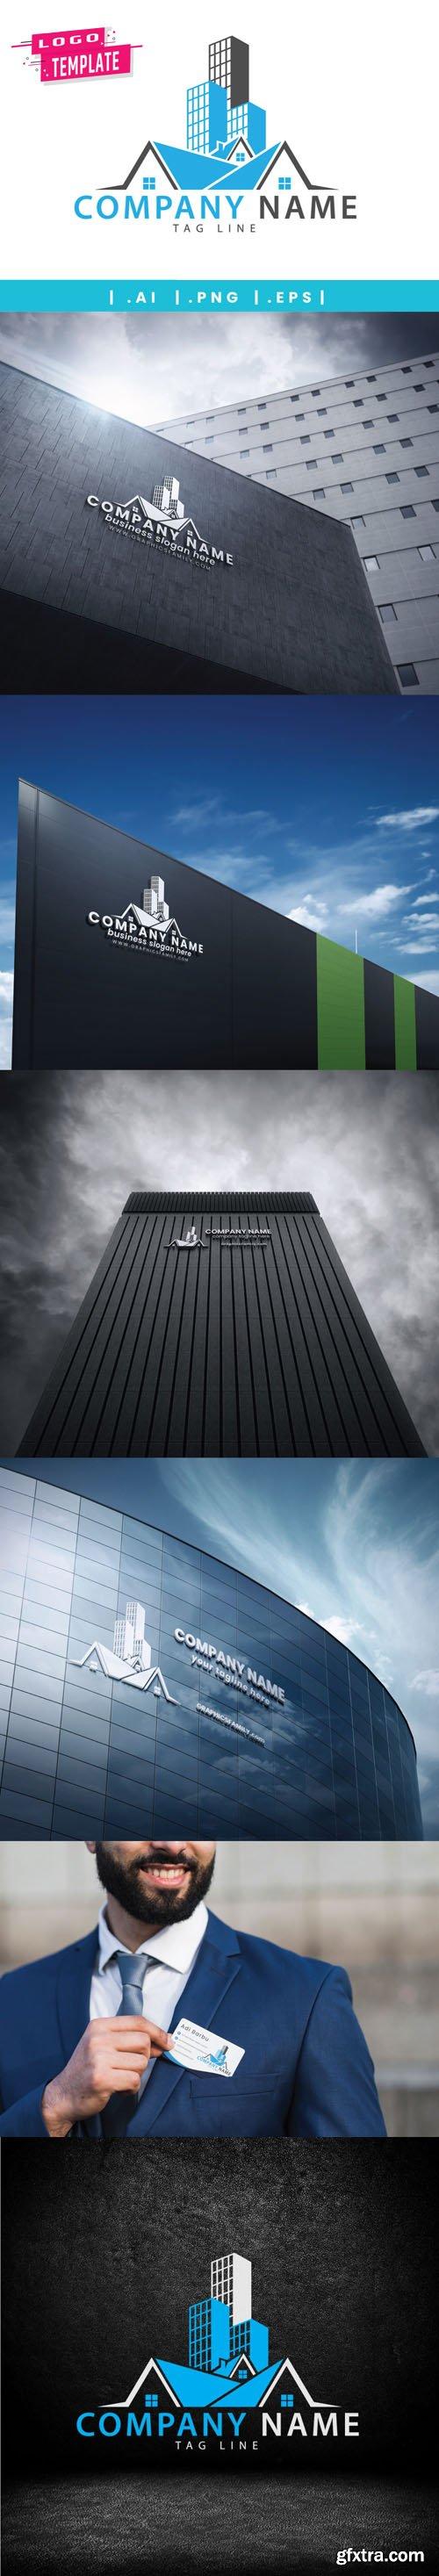 Real Estate Company Logo in Vector